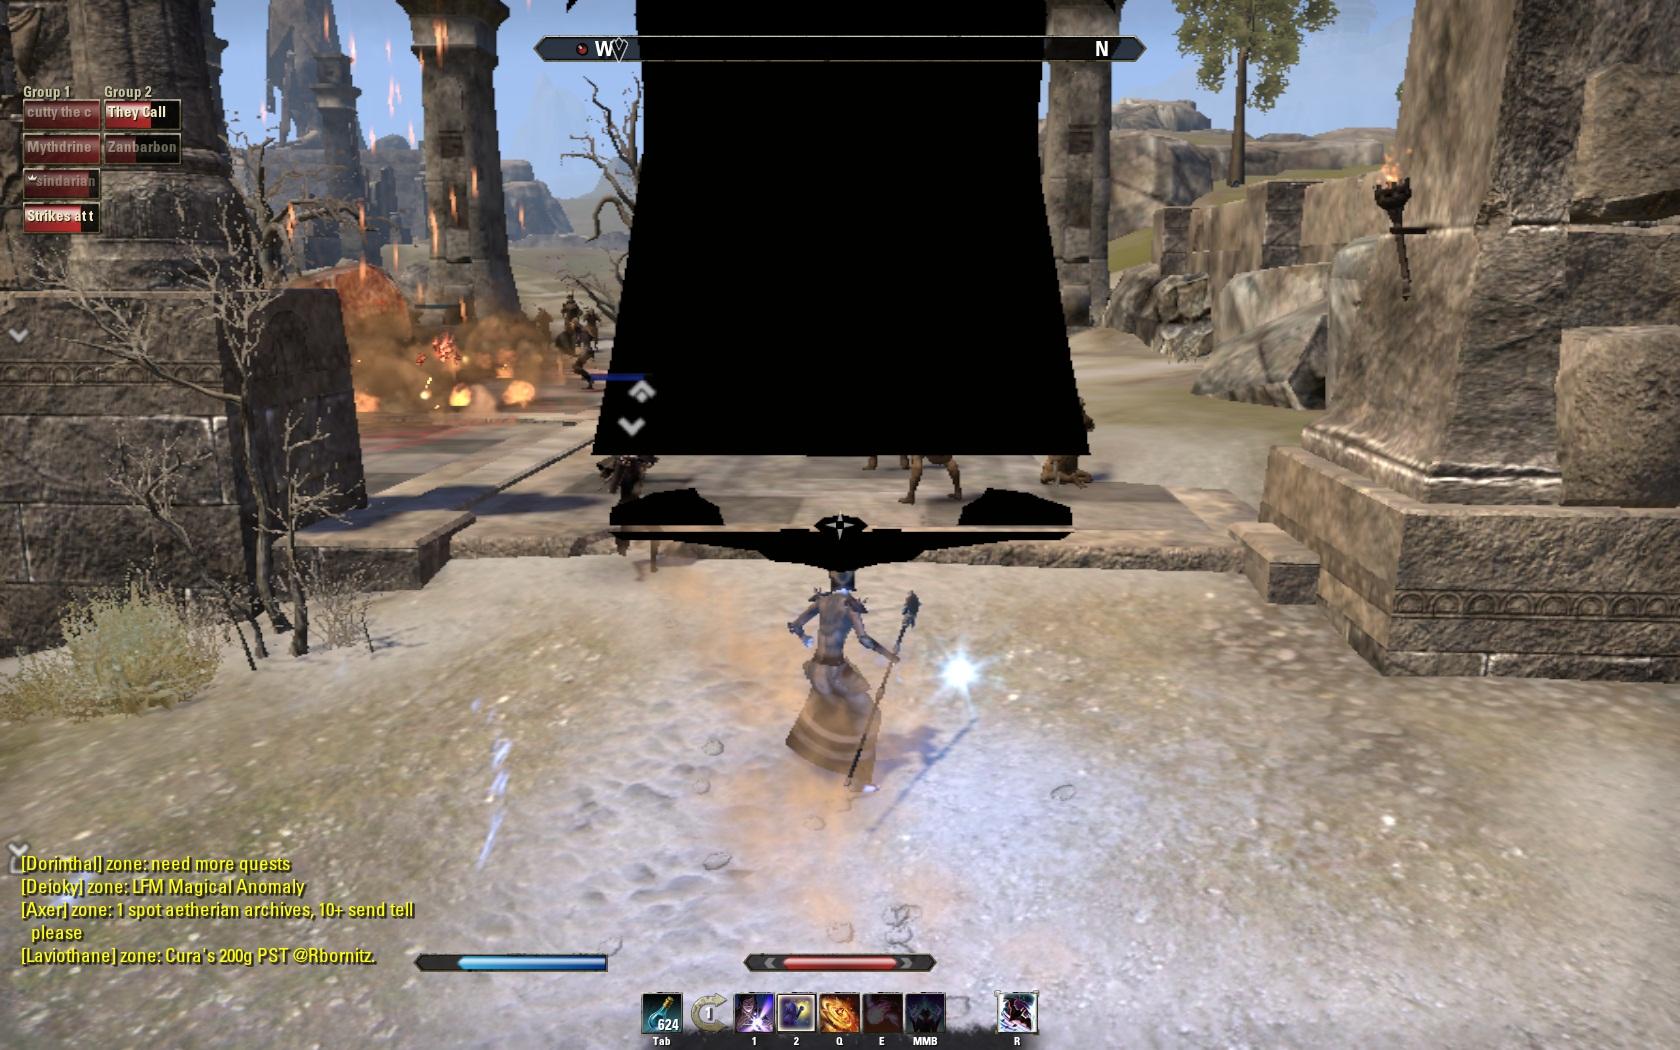 Image/Tearing happening in my screen — Elder Scrolls Online